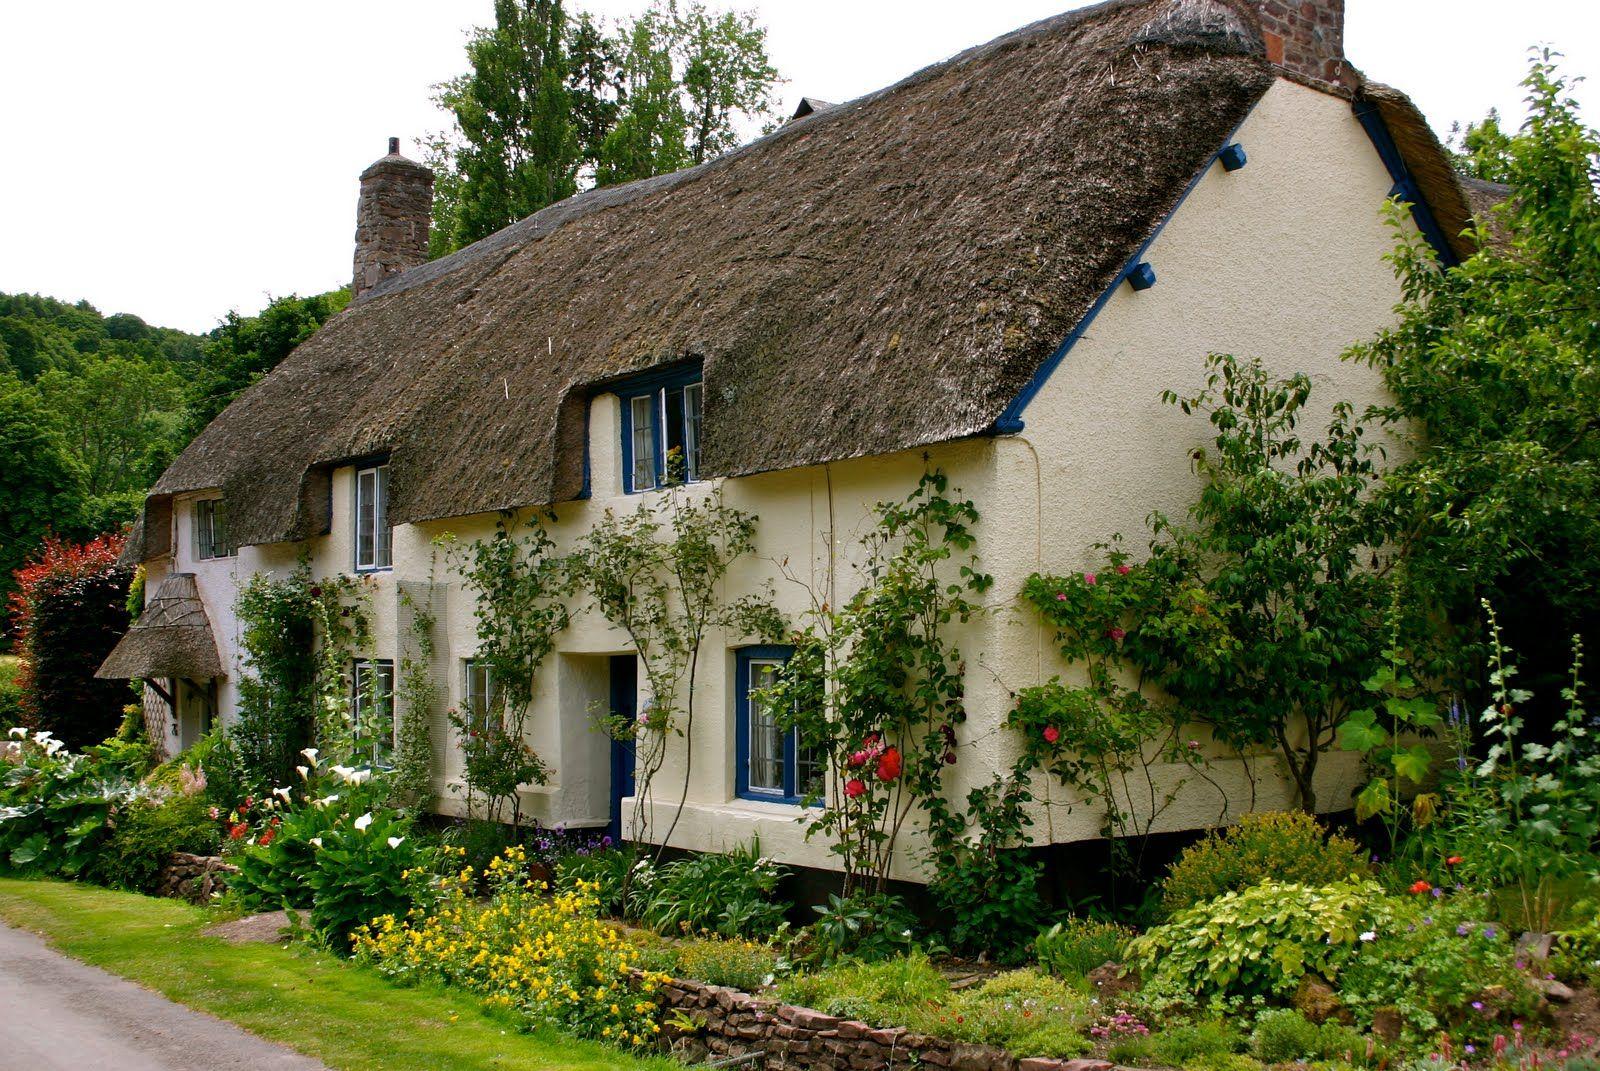 nice Eng Country Cottages Part - 11: Somerset cottages ♡ ~Rustic Living ~GJ * Kijk ook eens op mijn blog:  www.rusticlivingbygj.blogspot.nl